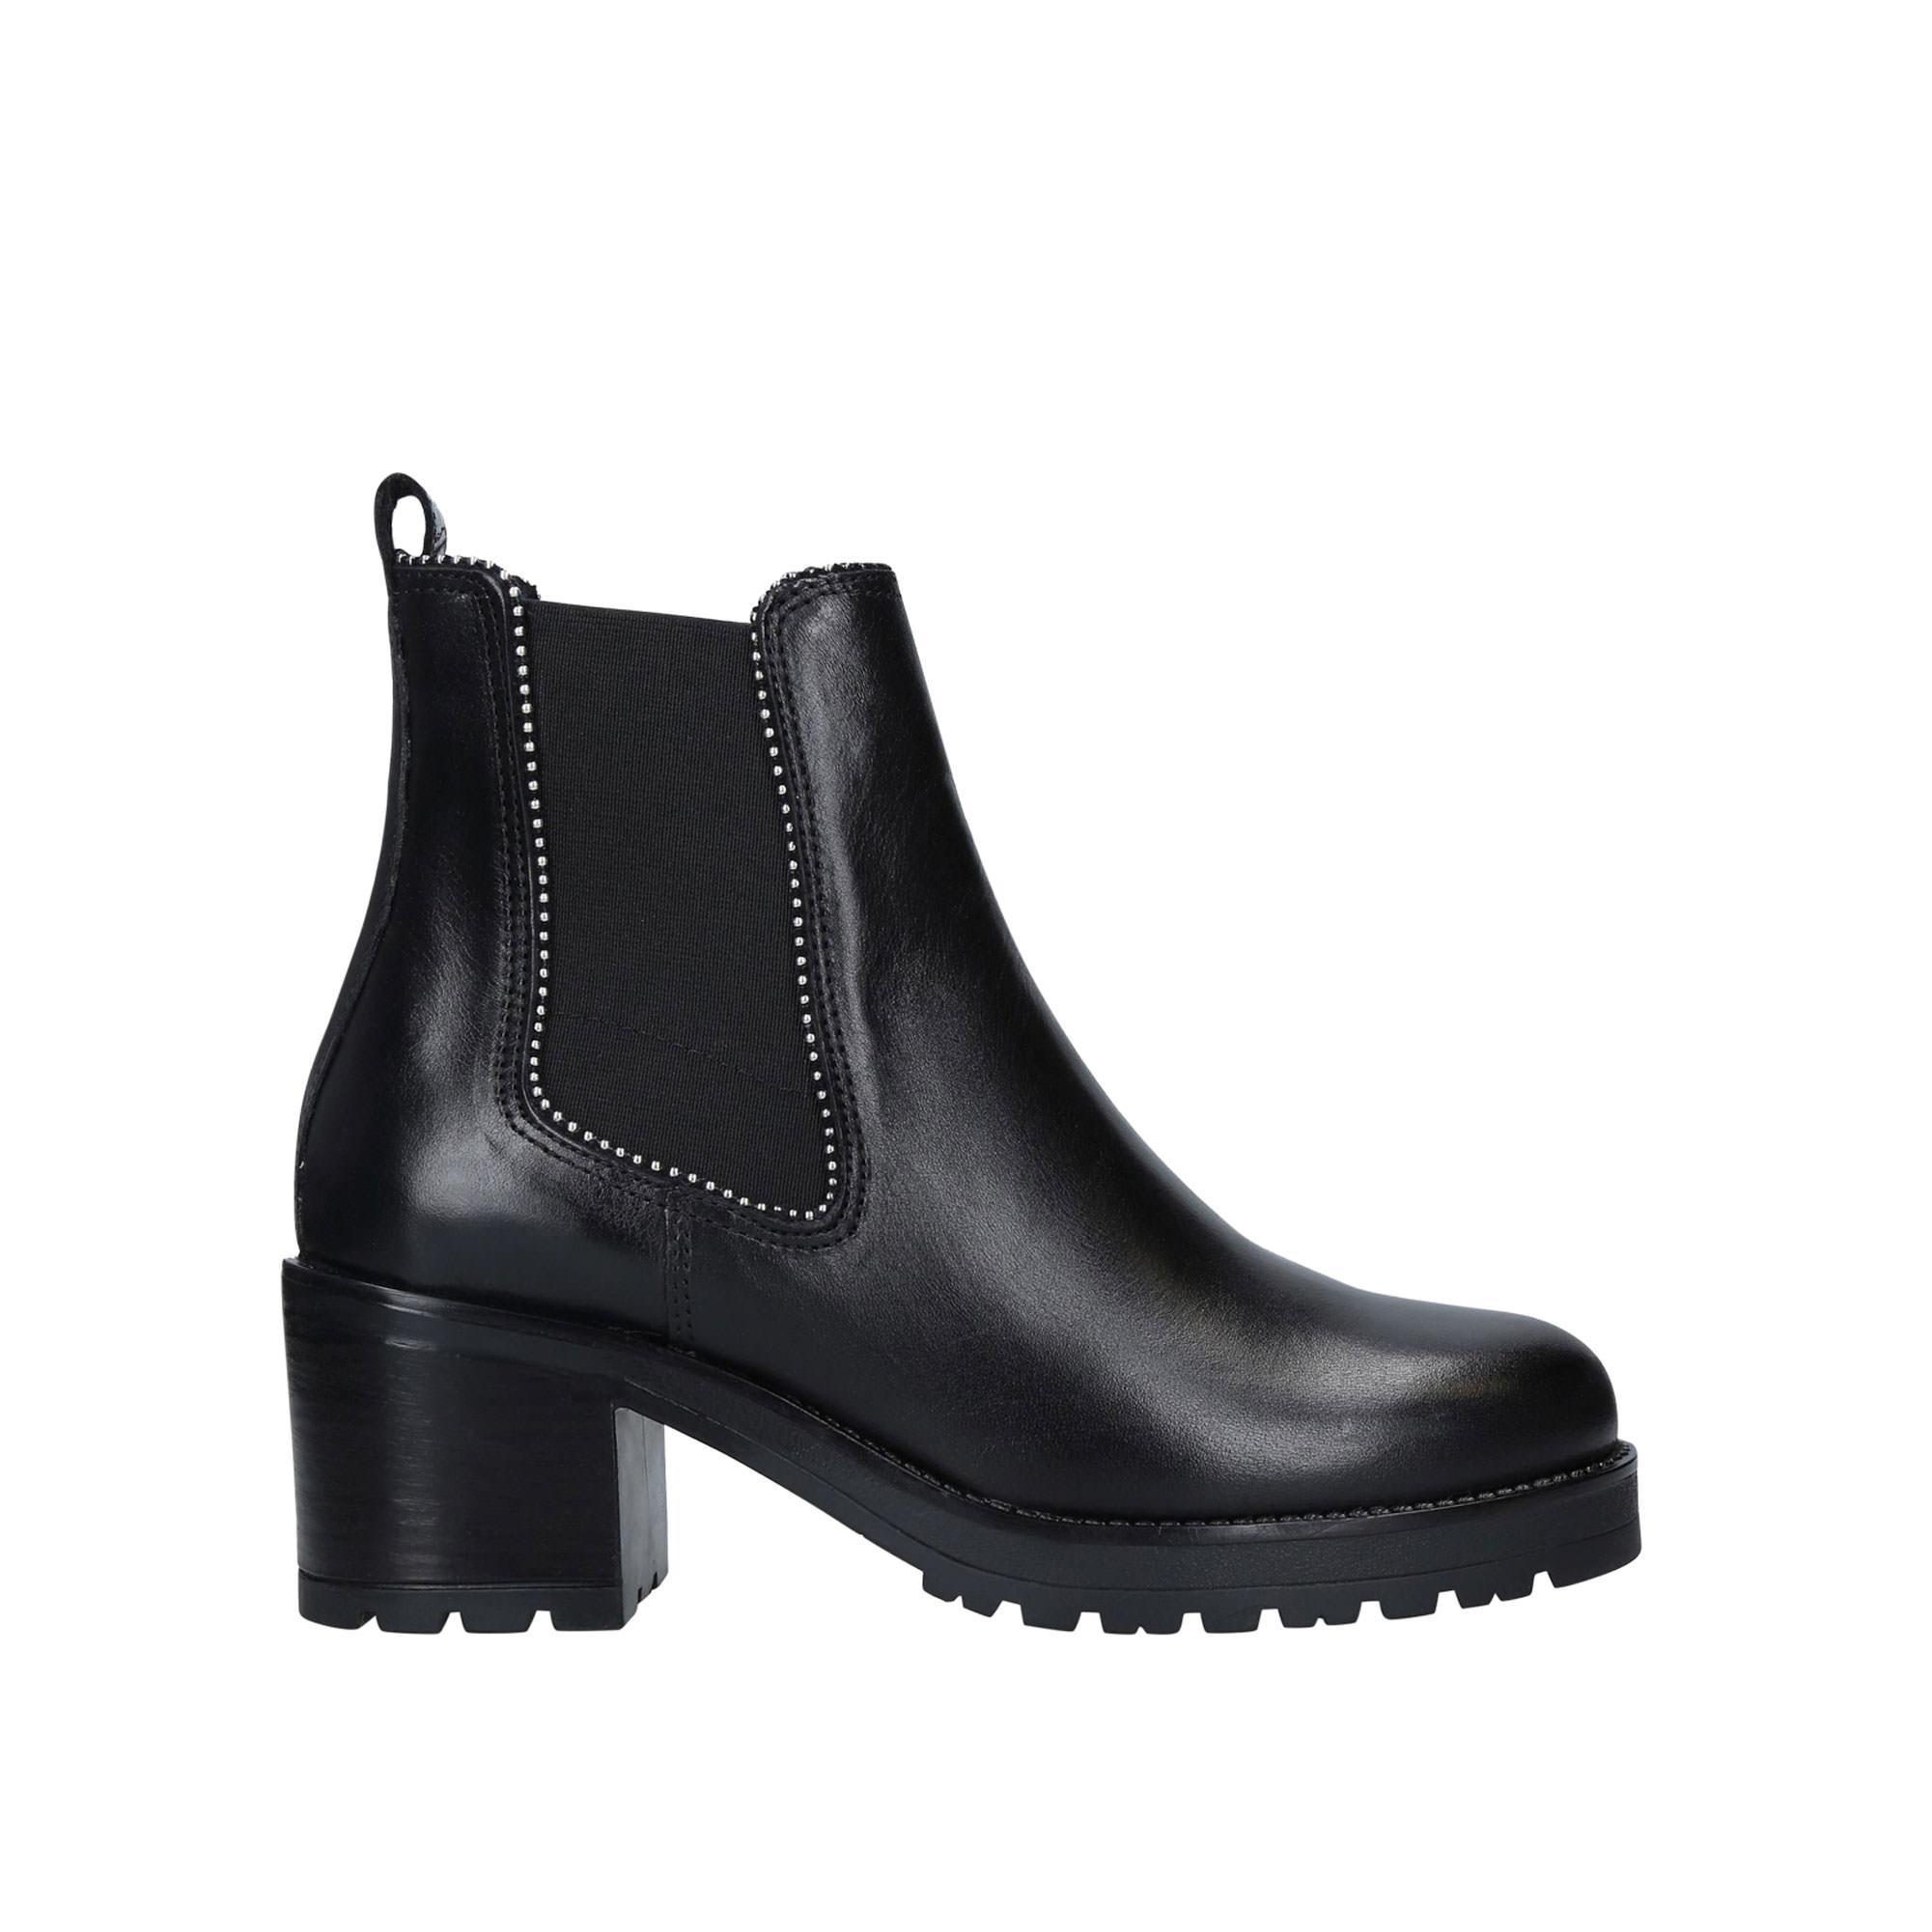 Thrill Boots